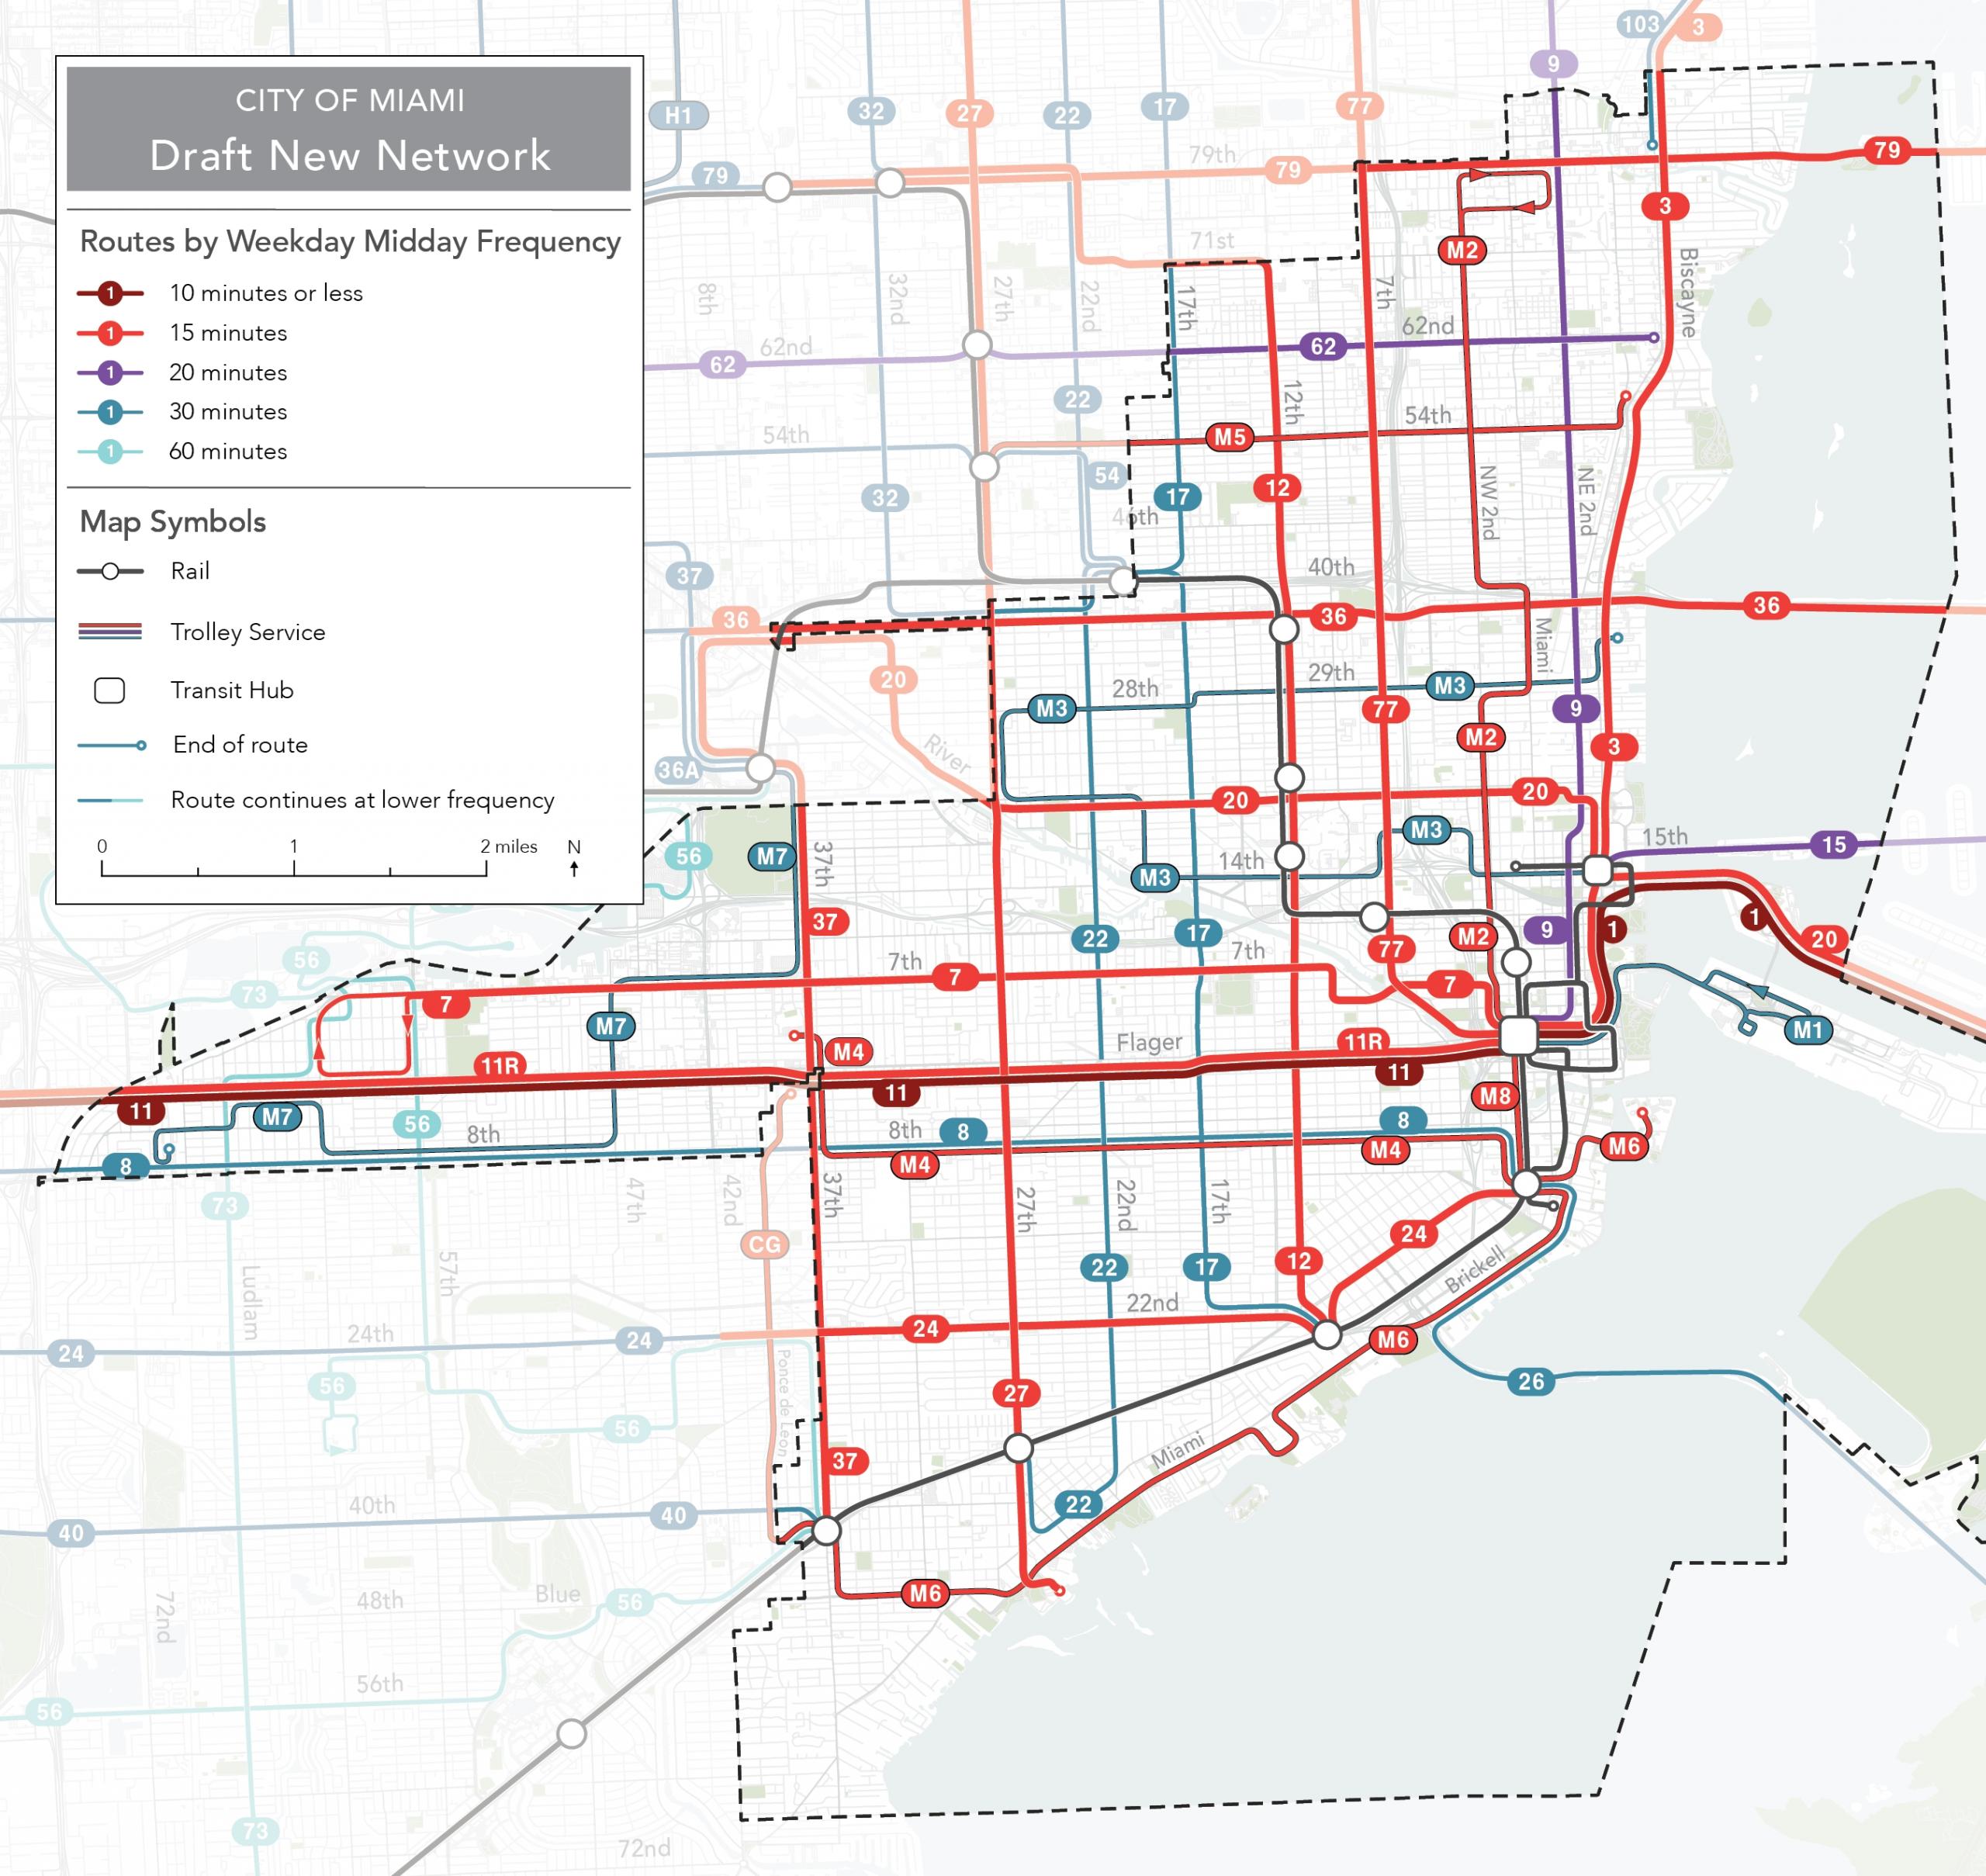 28 Miami Dade Bus Routes Map - Maps Online For You regarding Miami Dade Train Map